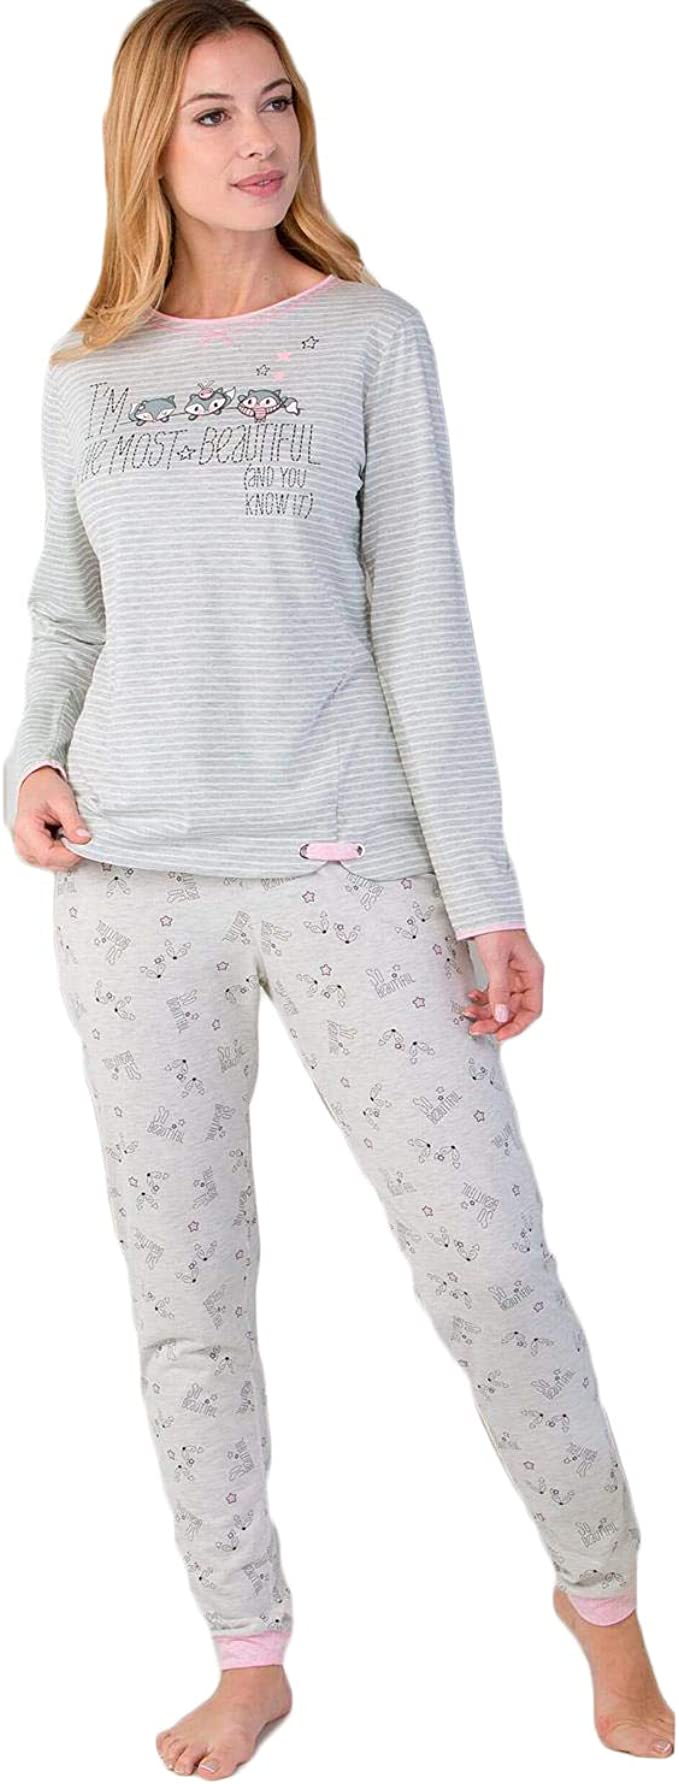 Massana - Pijama Beautiful - M, GRIS: Amazon.es: Ropa y ...